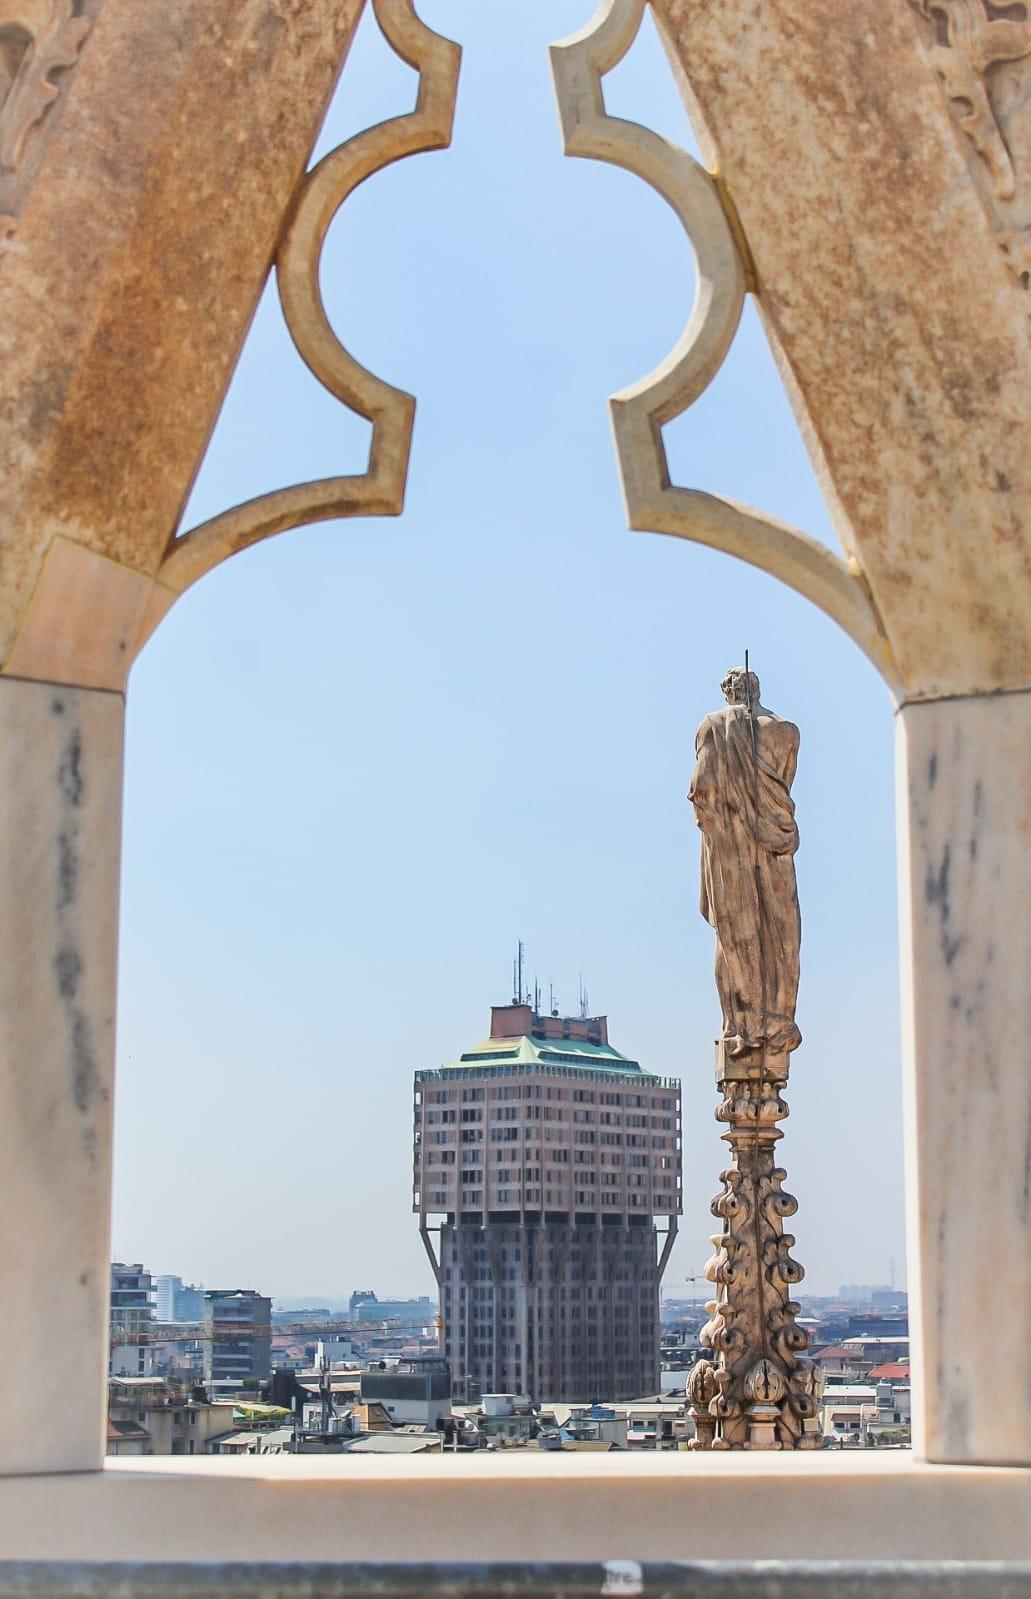 Torre Velasca vista dal Duomo. ©2019 Alessandro Barberio